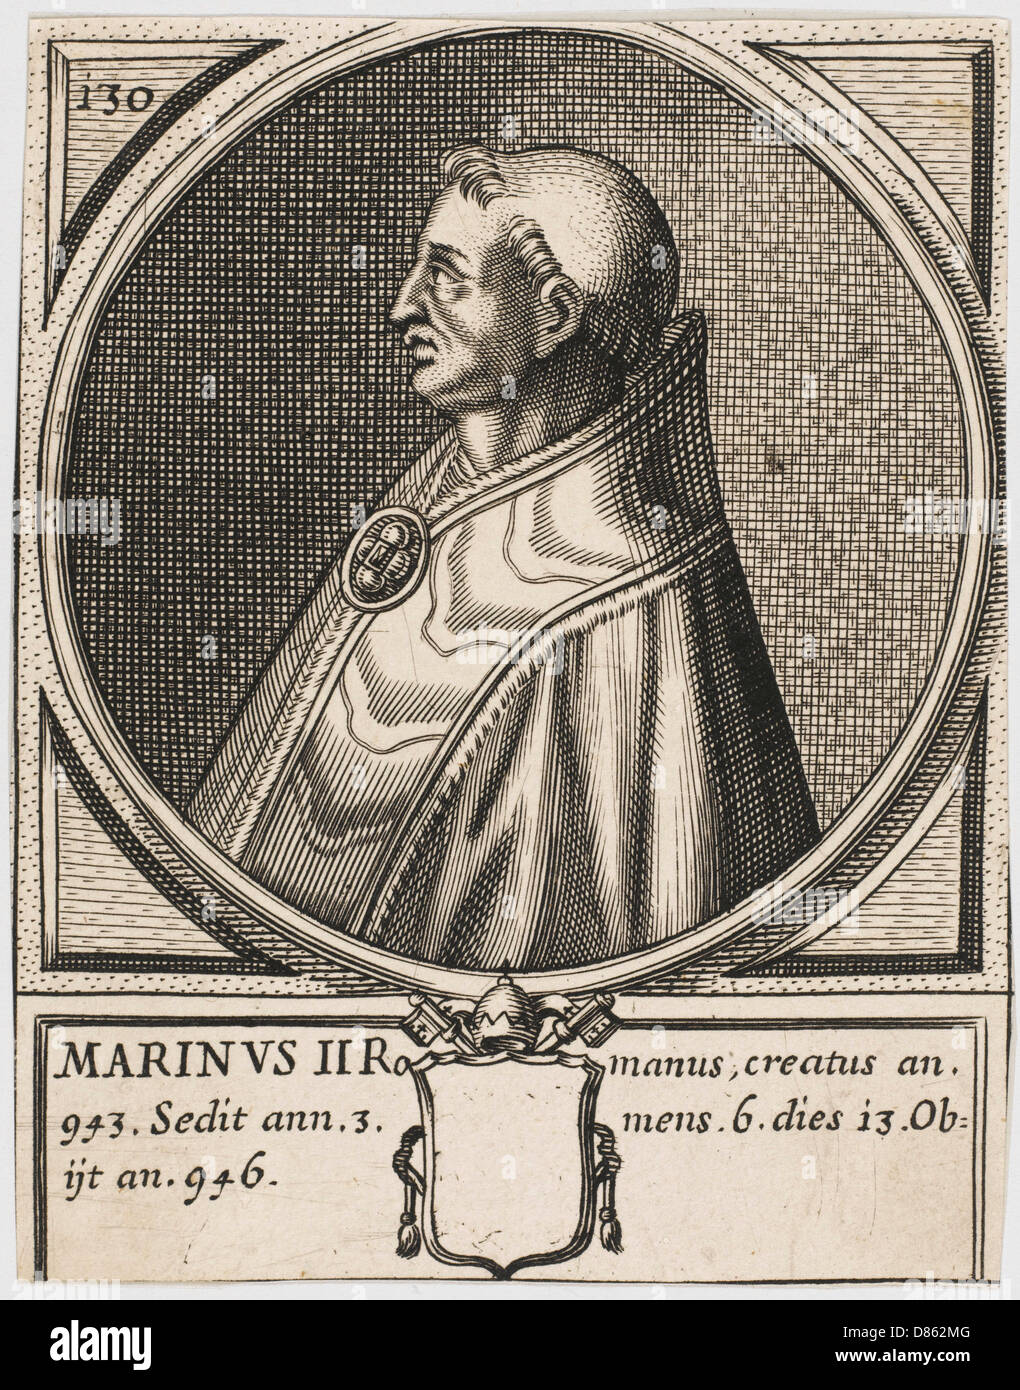 Pope Martinus Ii - Stock Image